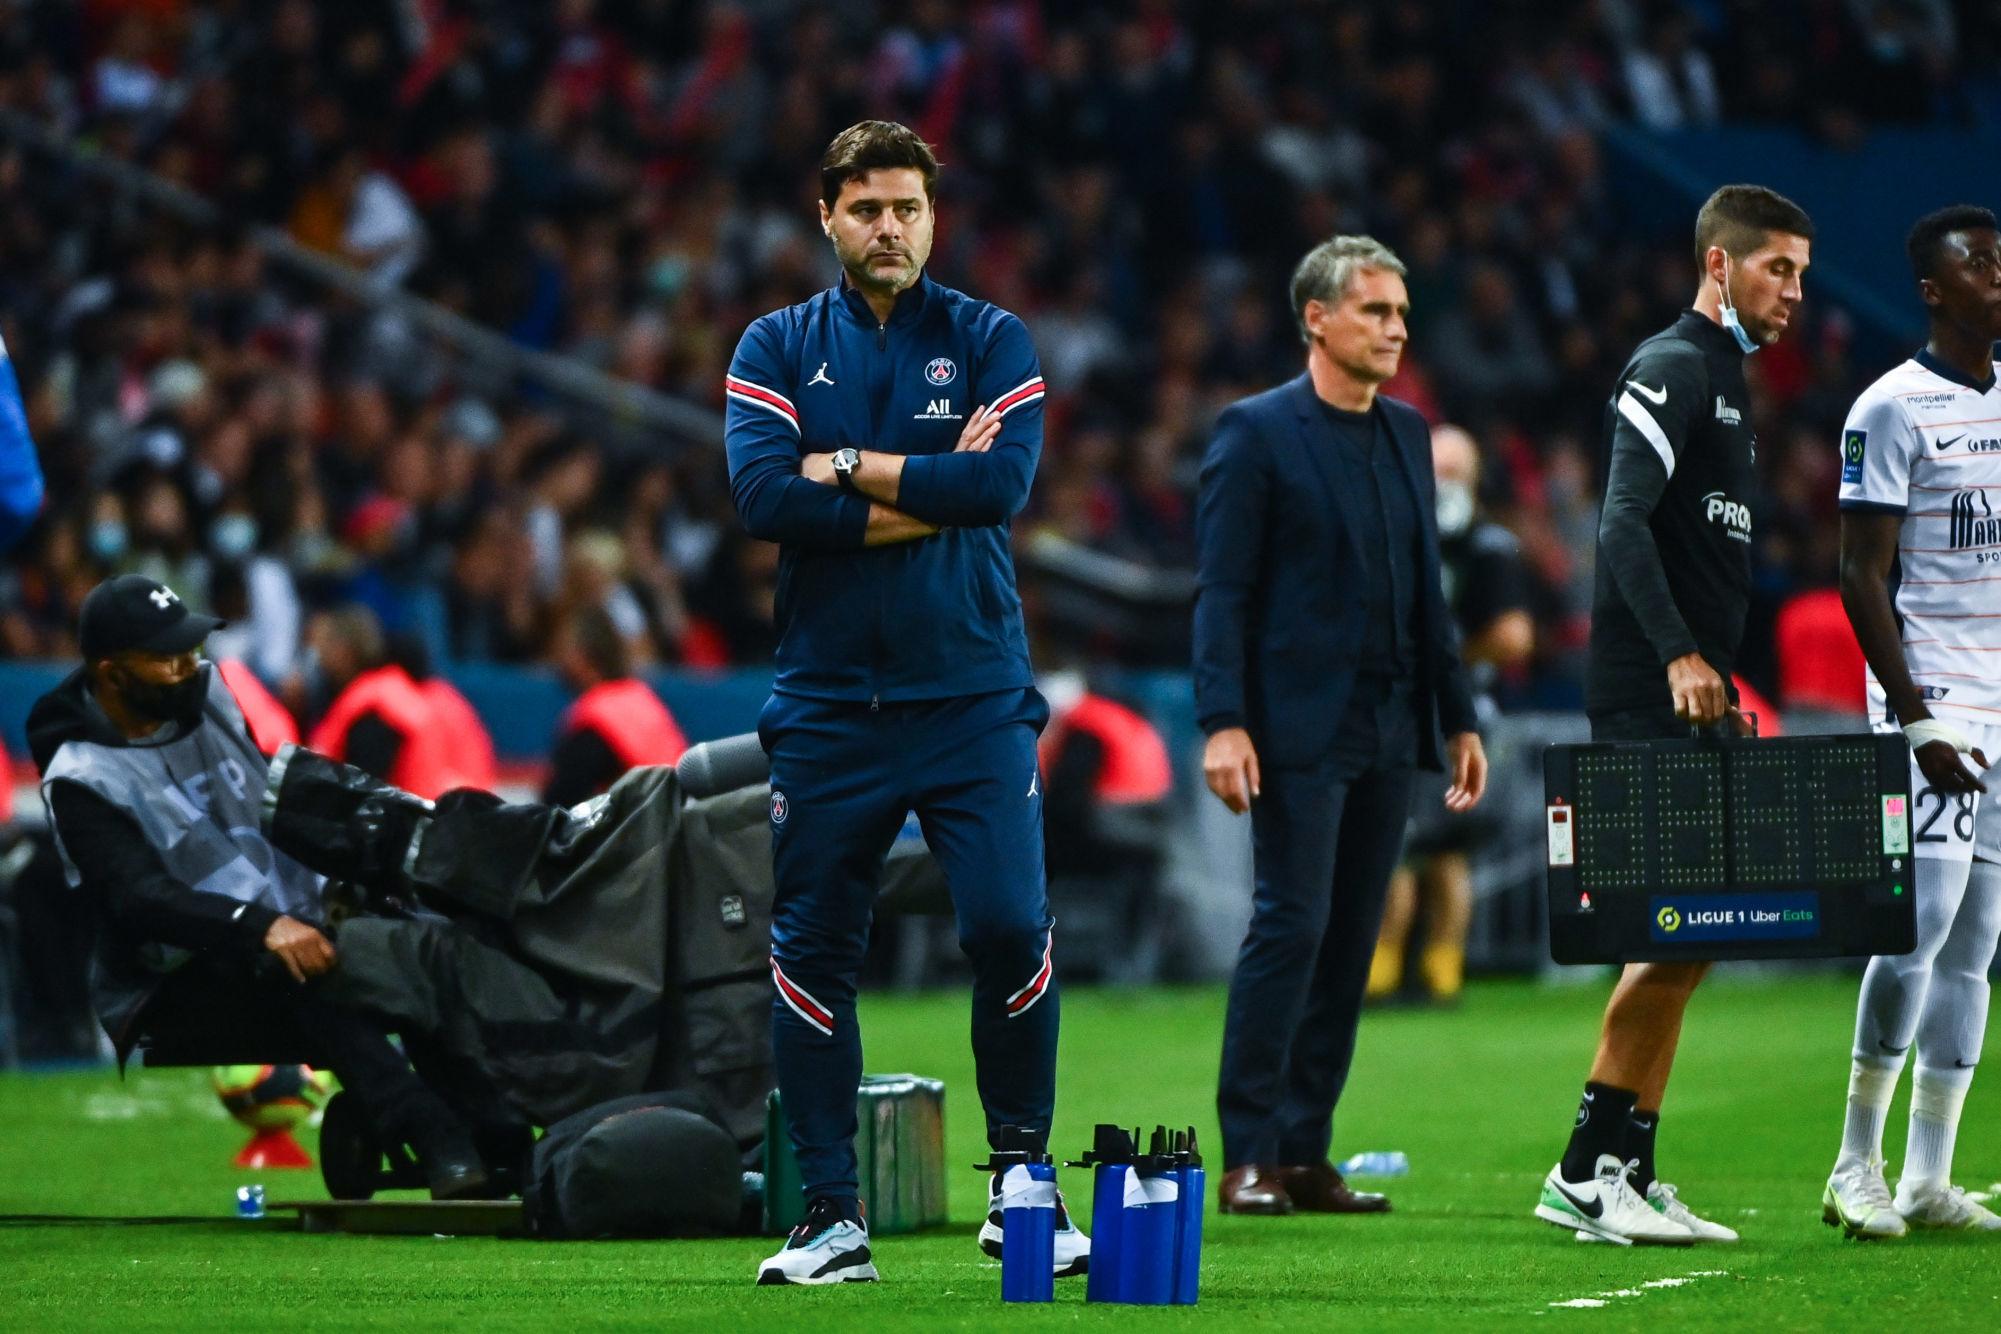 PSG/Montpellier - Pochettino en conf : progrès, gardiens et attaquants